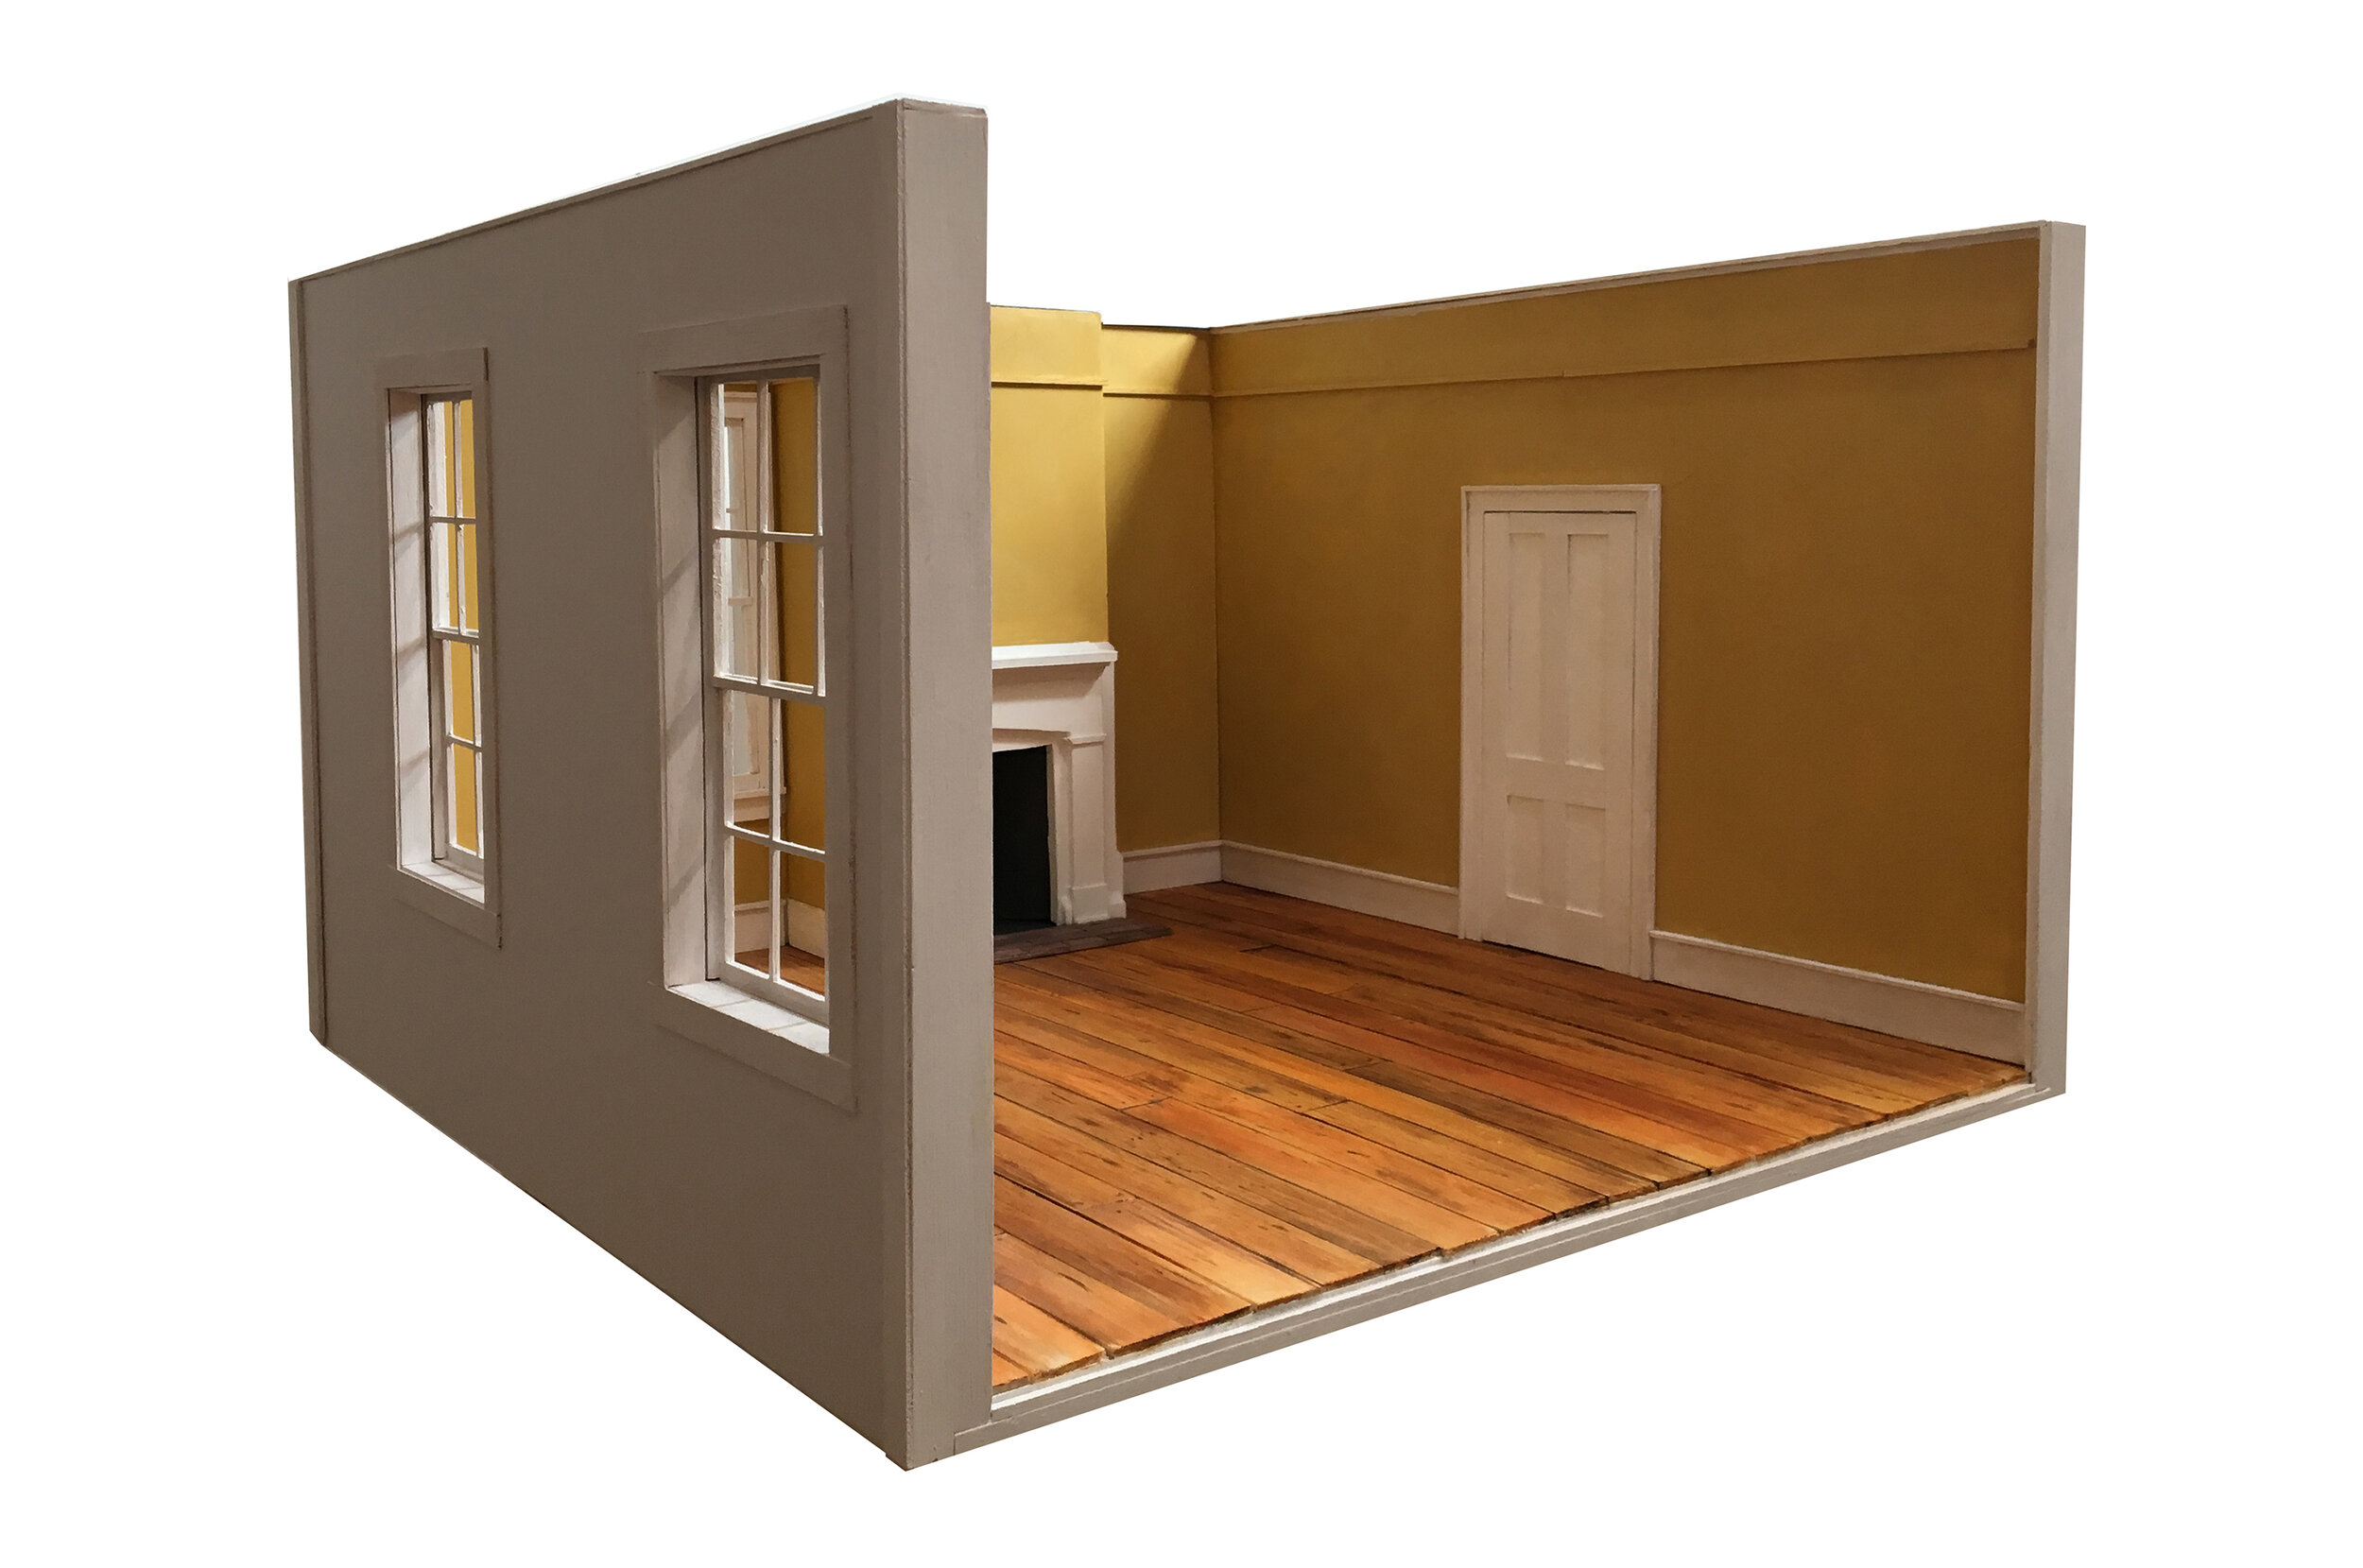 Model of Edward Hopper's Boyhood Bedroom in Nyack, NY   2019  Balsa Wood, Foam Core  15 x 23 x 23 inches